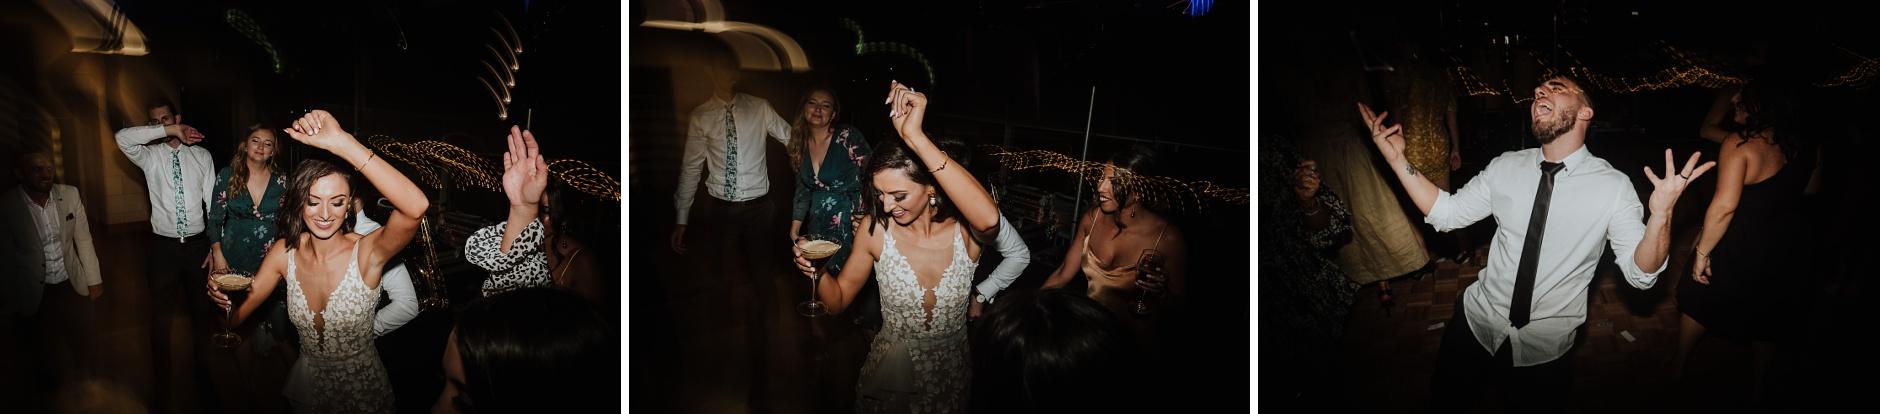 Sydney-Wedding-Photographer_0178.jpg